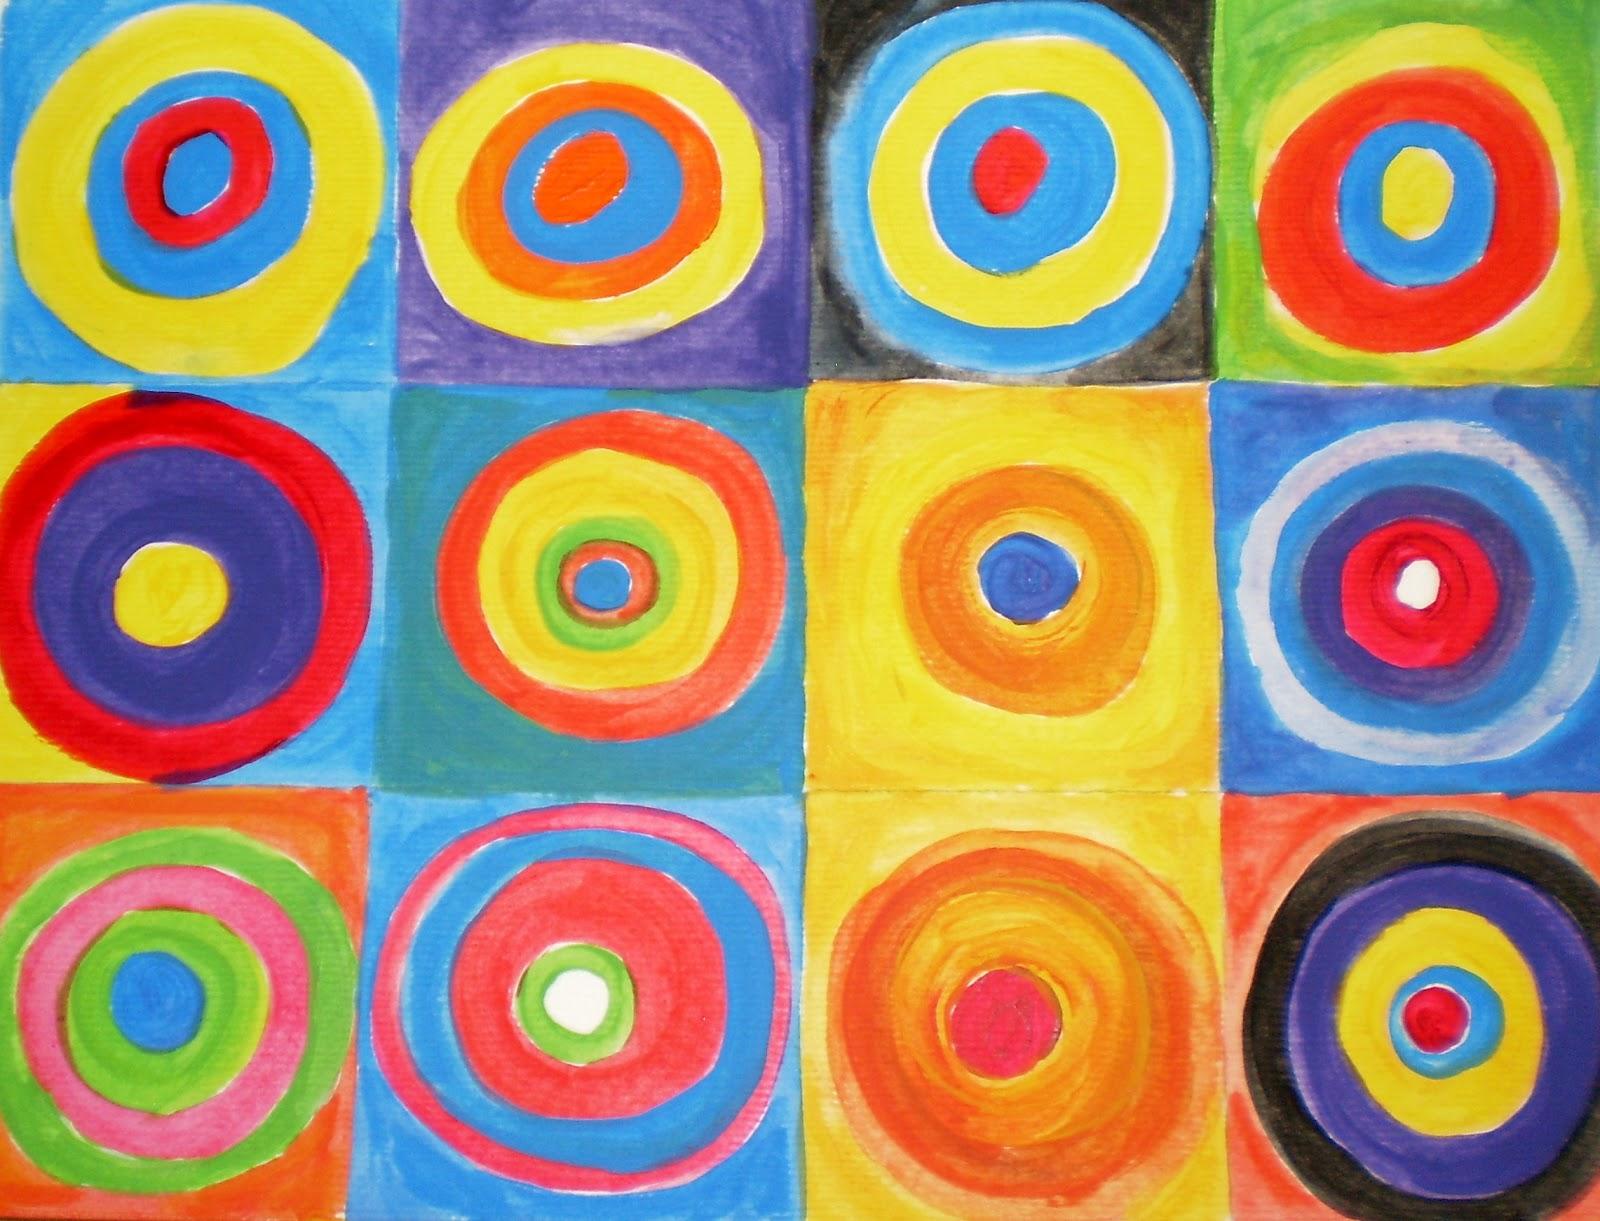 mechelle designs: Concentric Circles